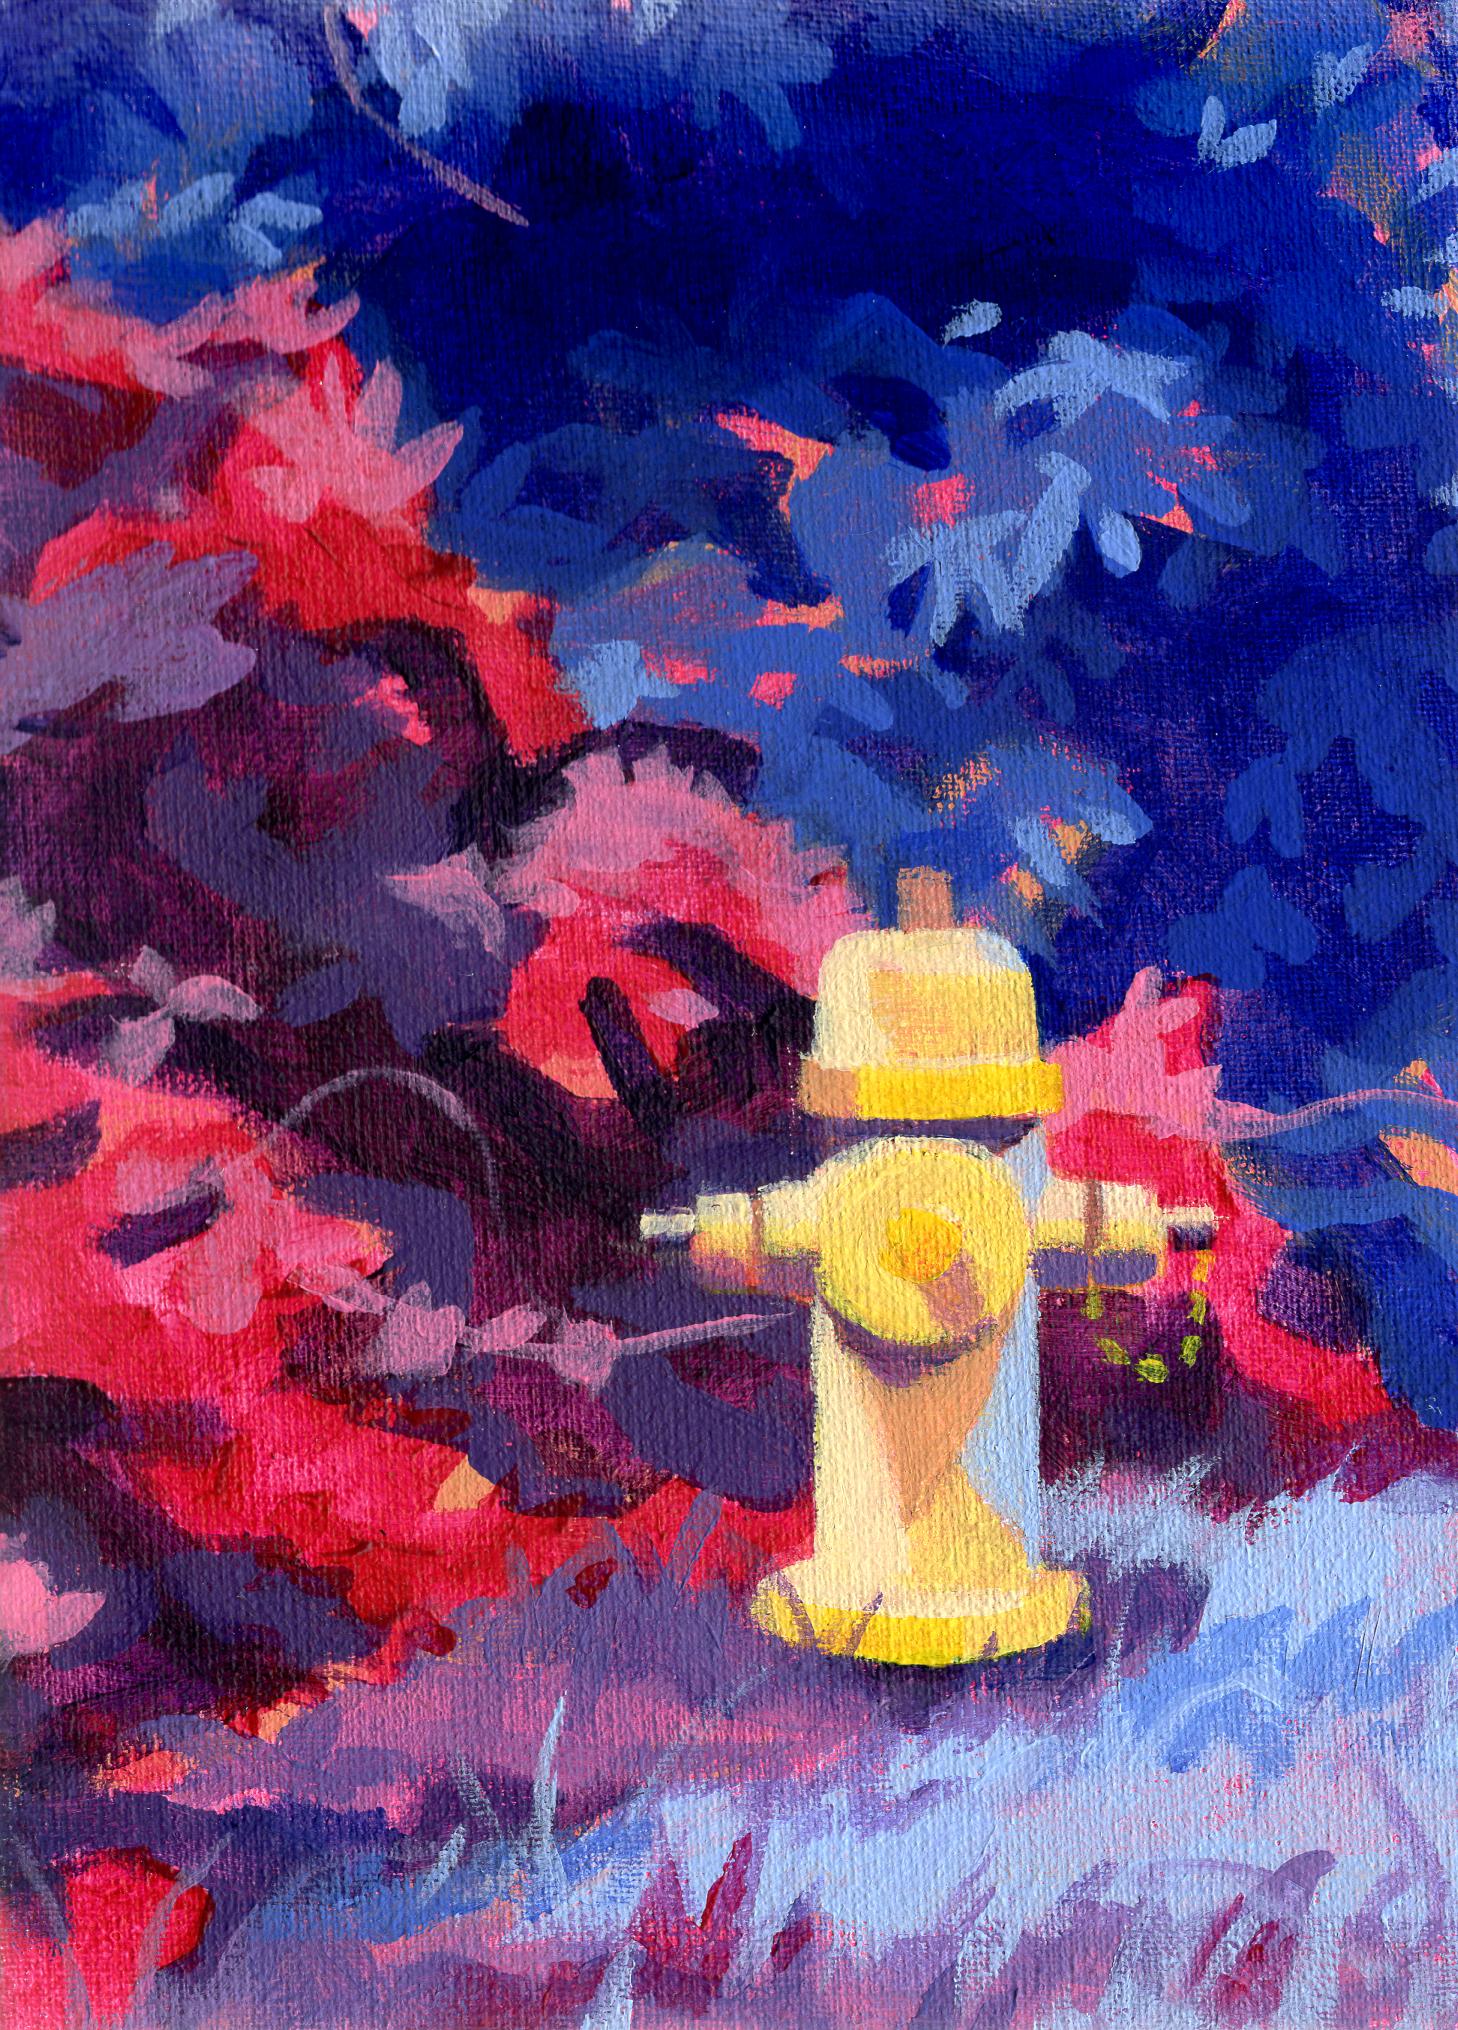 Myrthe Biesheuvel - Fire Hydrant, 18x13cm, Acryl